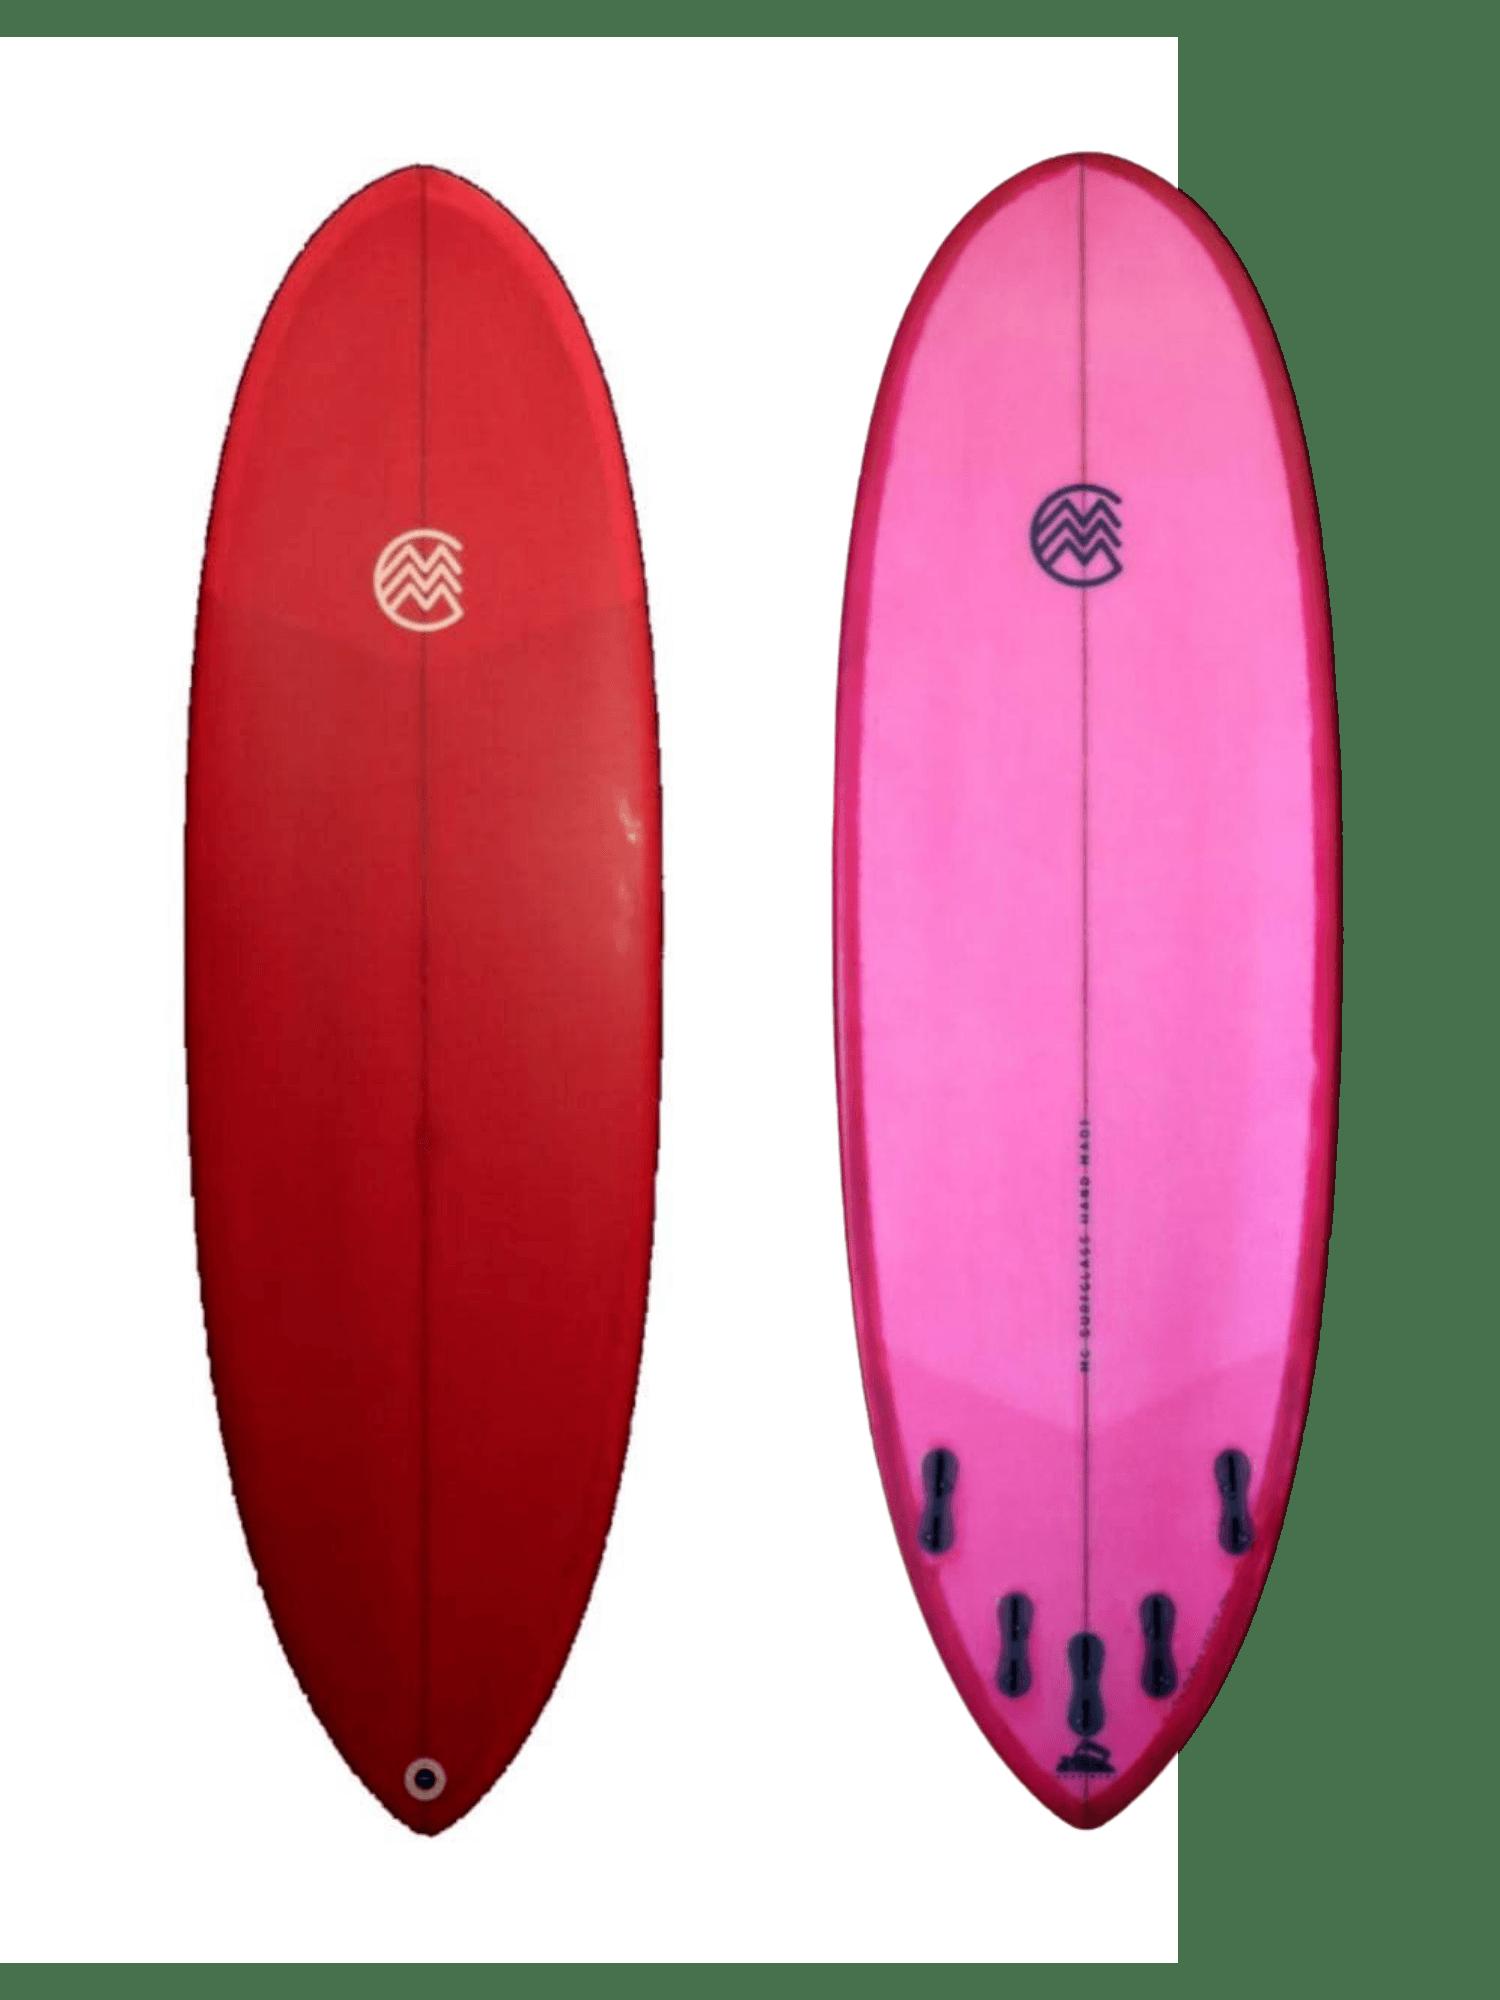 MC Surf Glass - Miniwhale 6'0 - Seminova